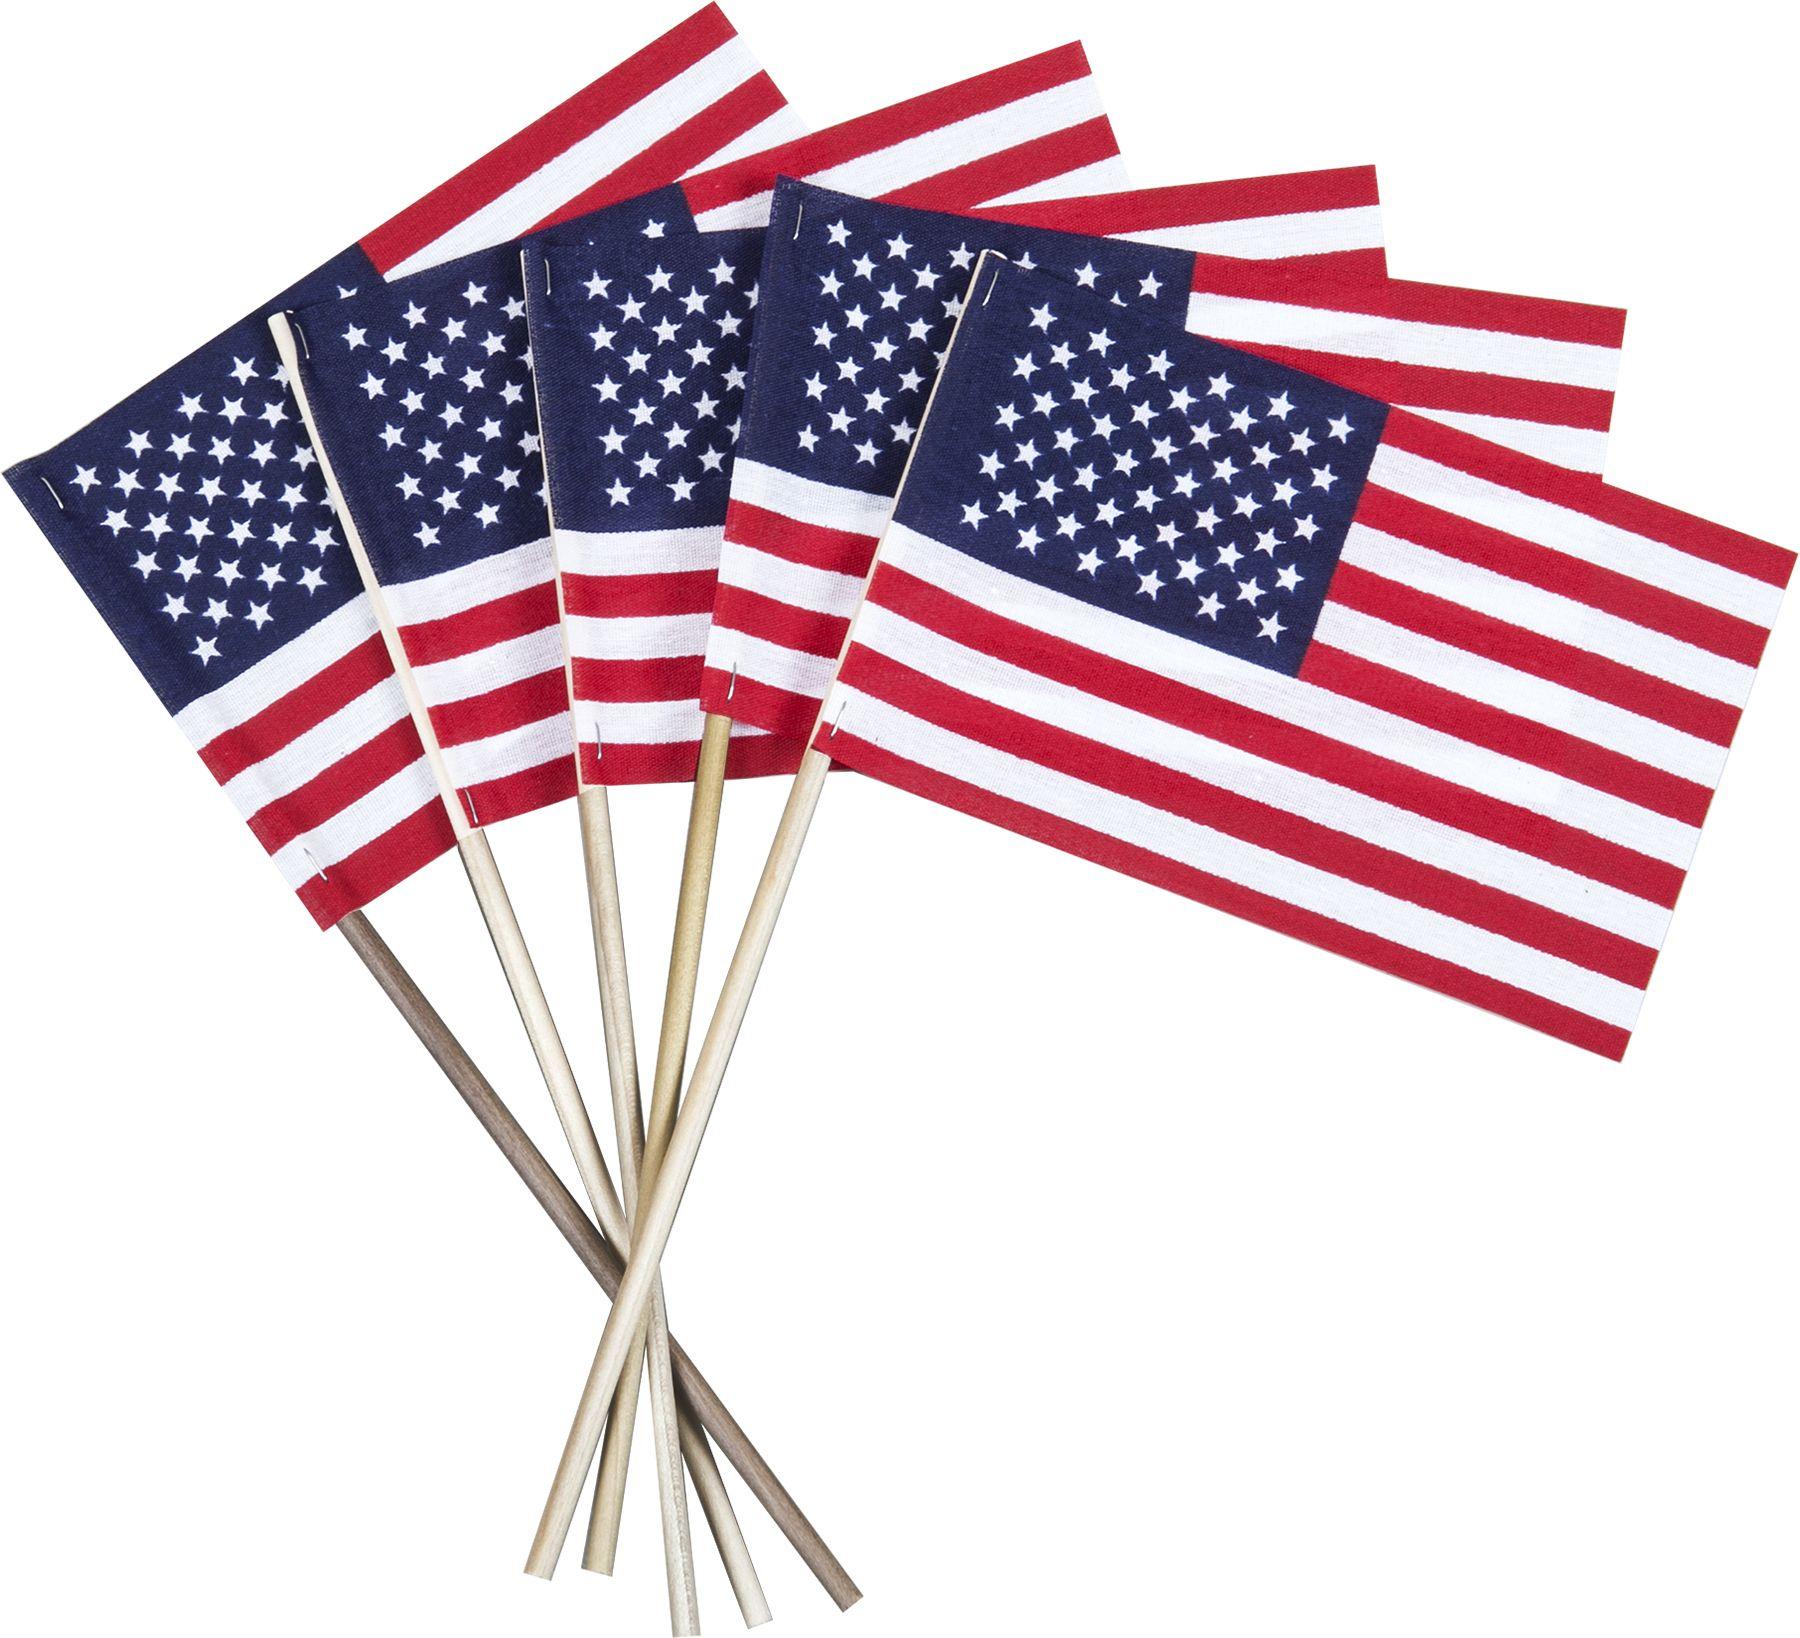 4 X 6 Economy Cotton U S Stick Flags On A 10 Dowel 4th Of July Celebration Dowels Promotional Pens